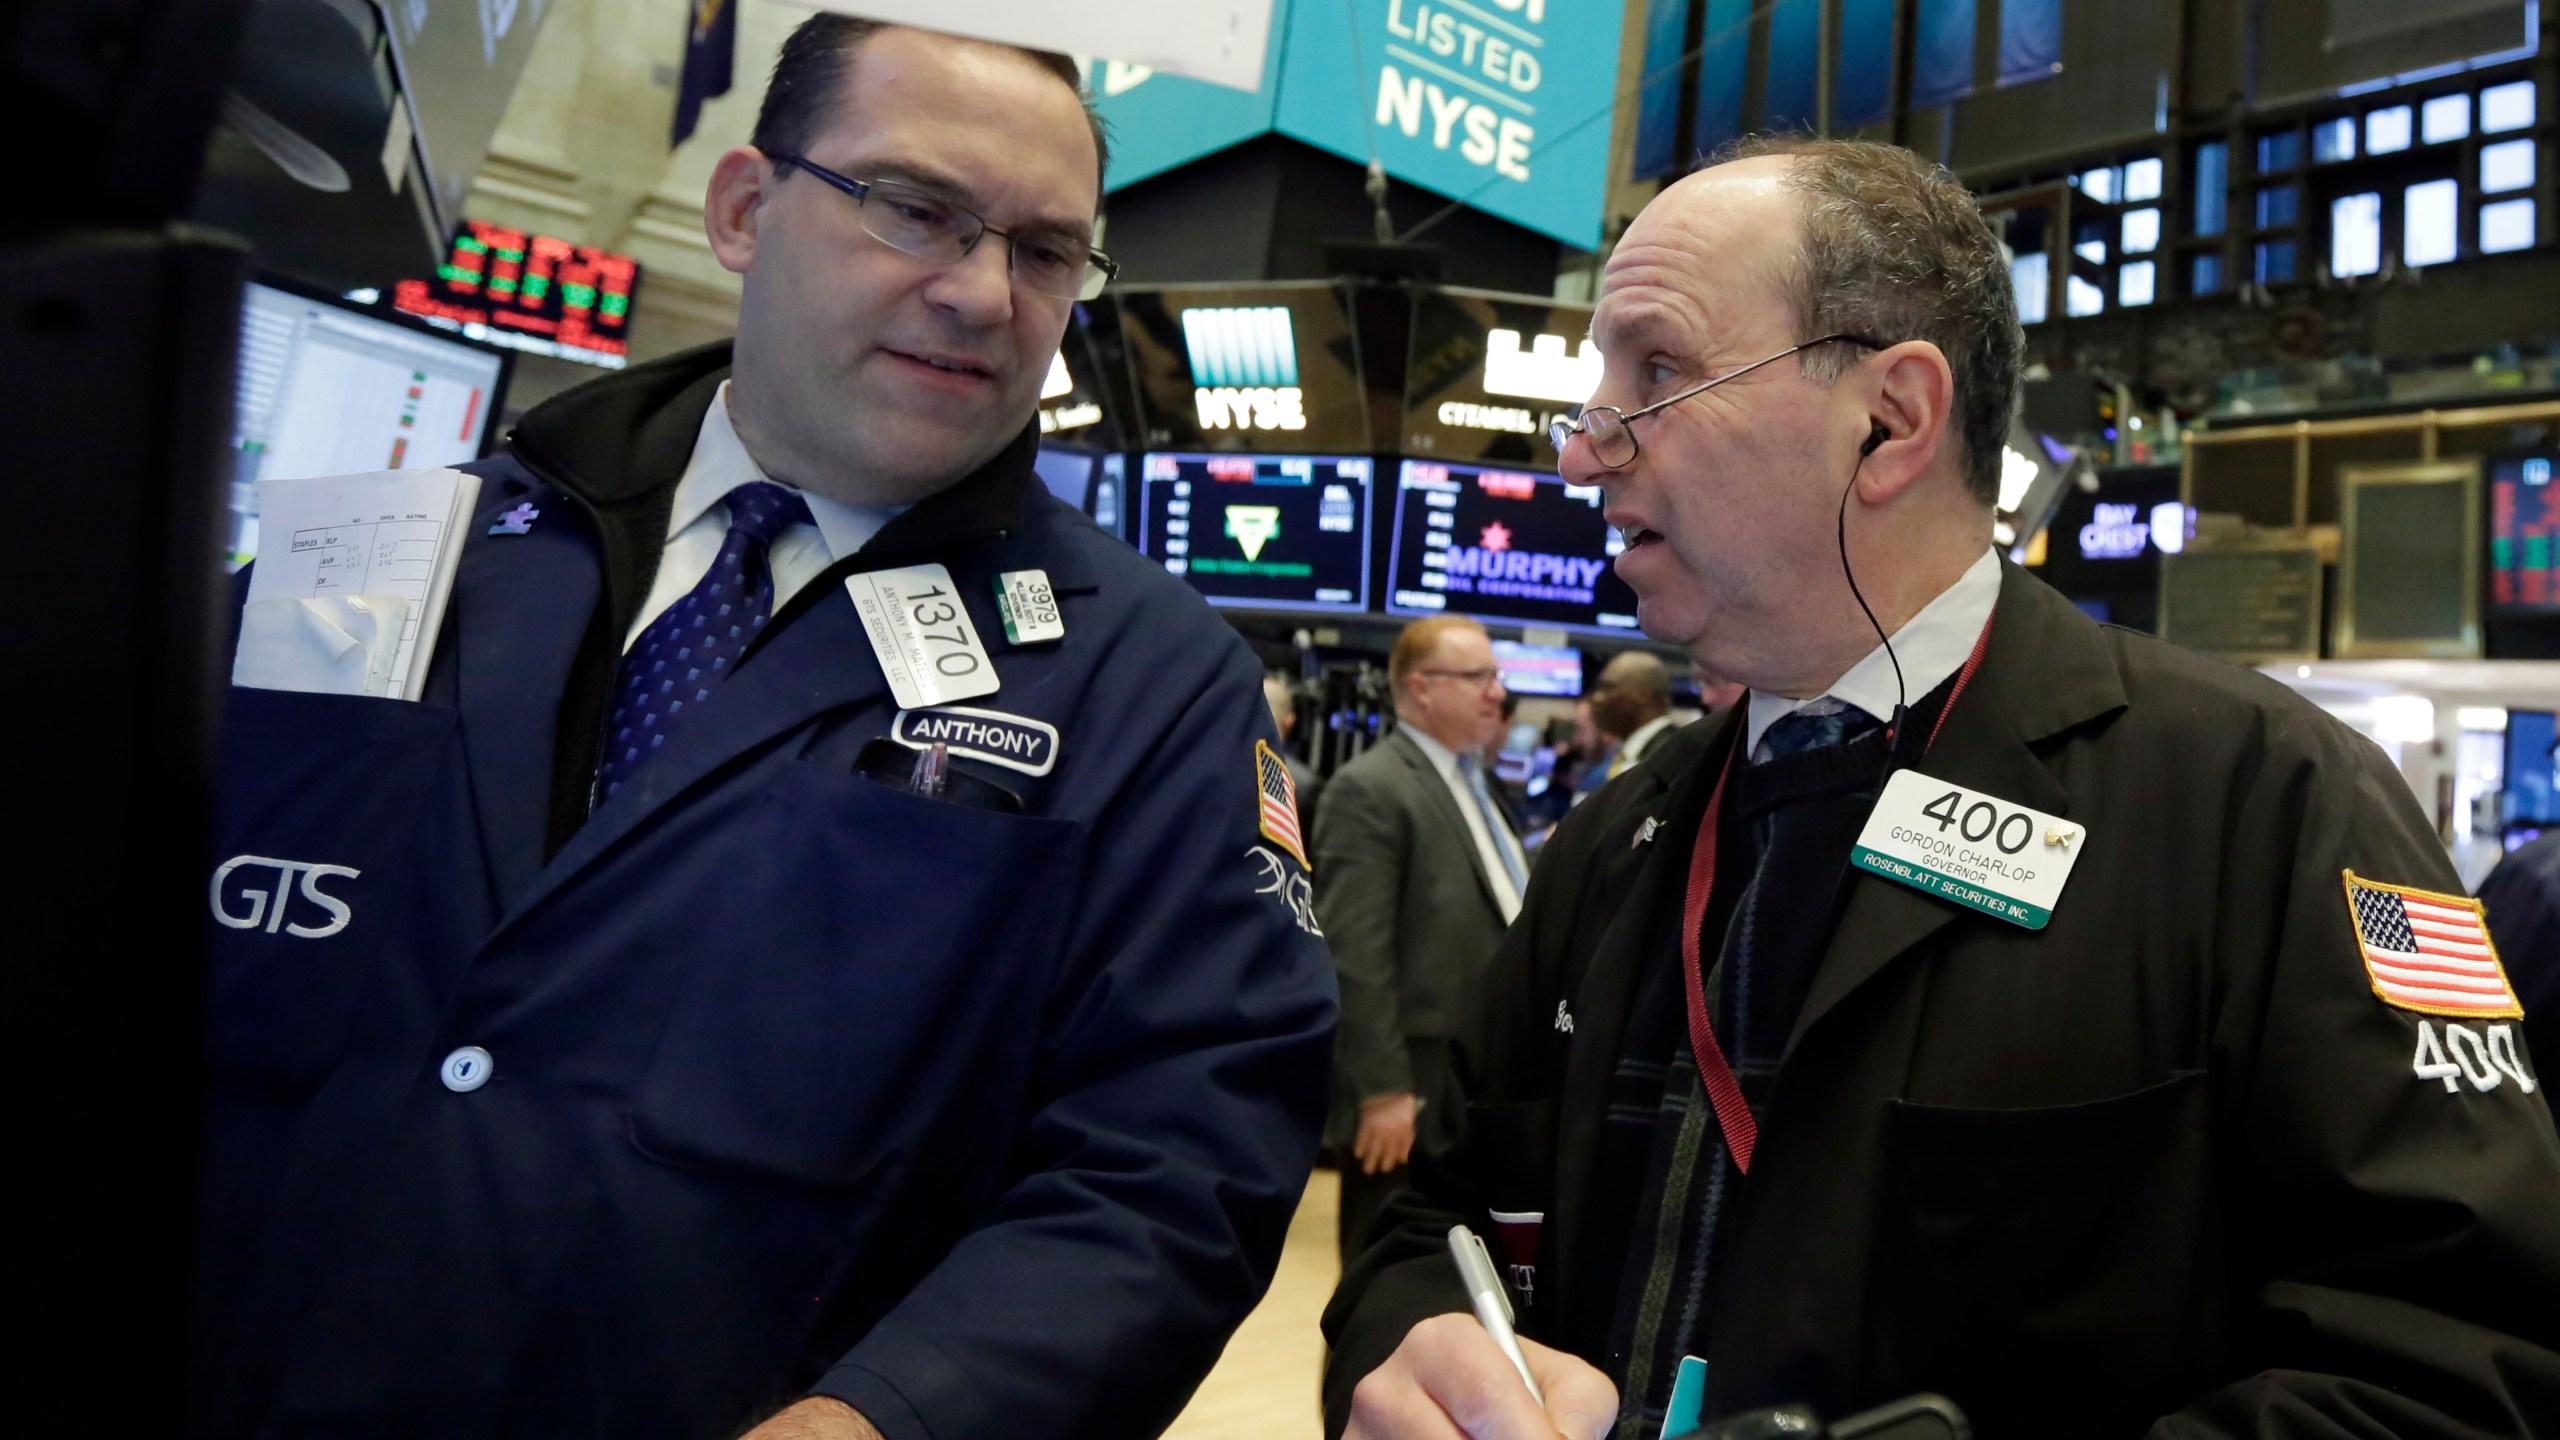 Financial_Markets_Wall_Street_09458-159532.jpg87986706